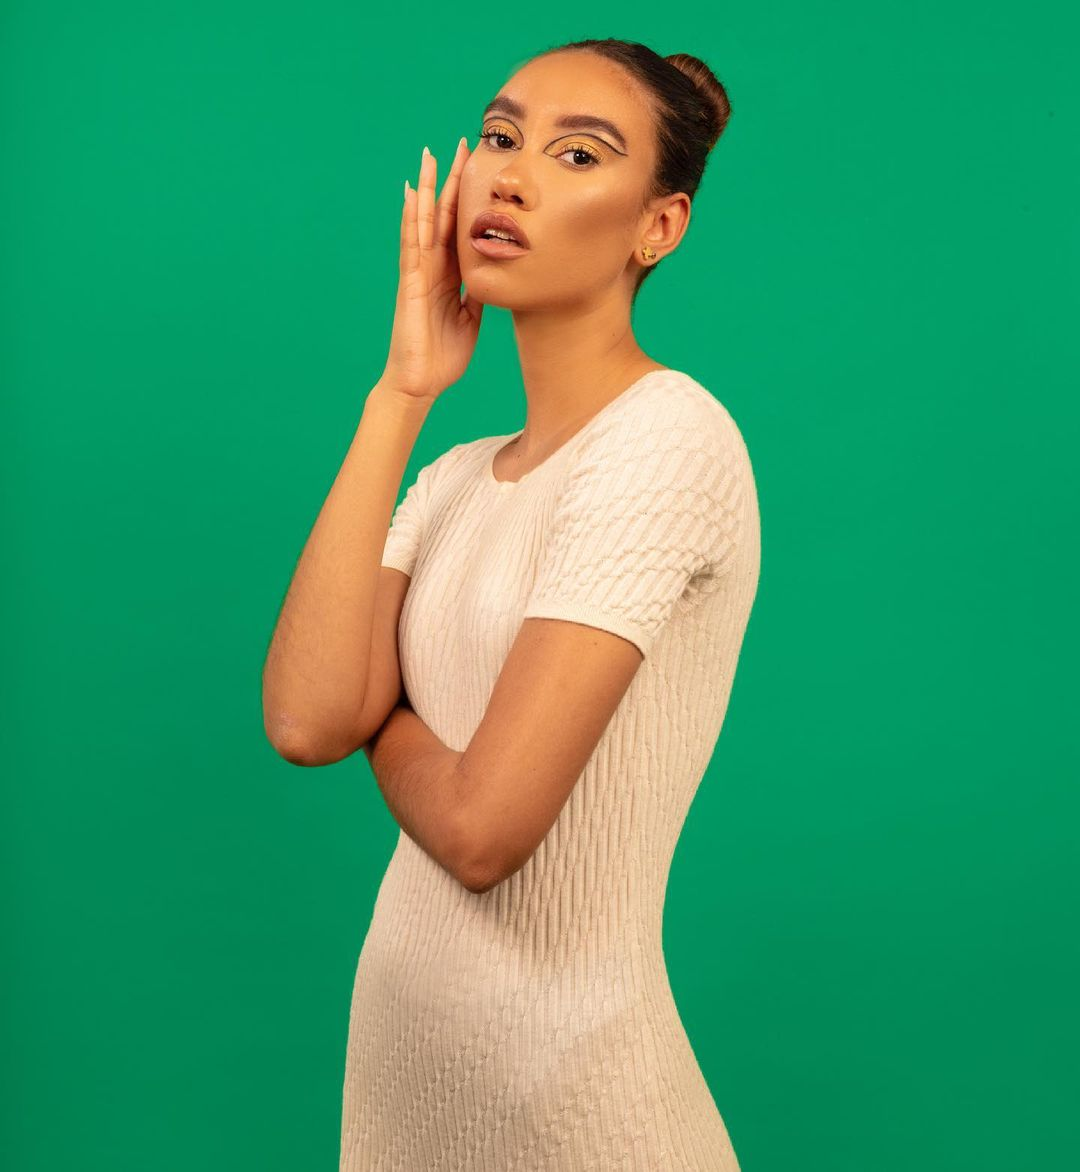 Model Gigi Maduq / Instagram